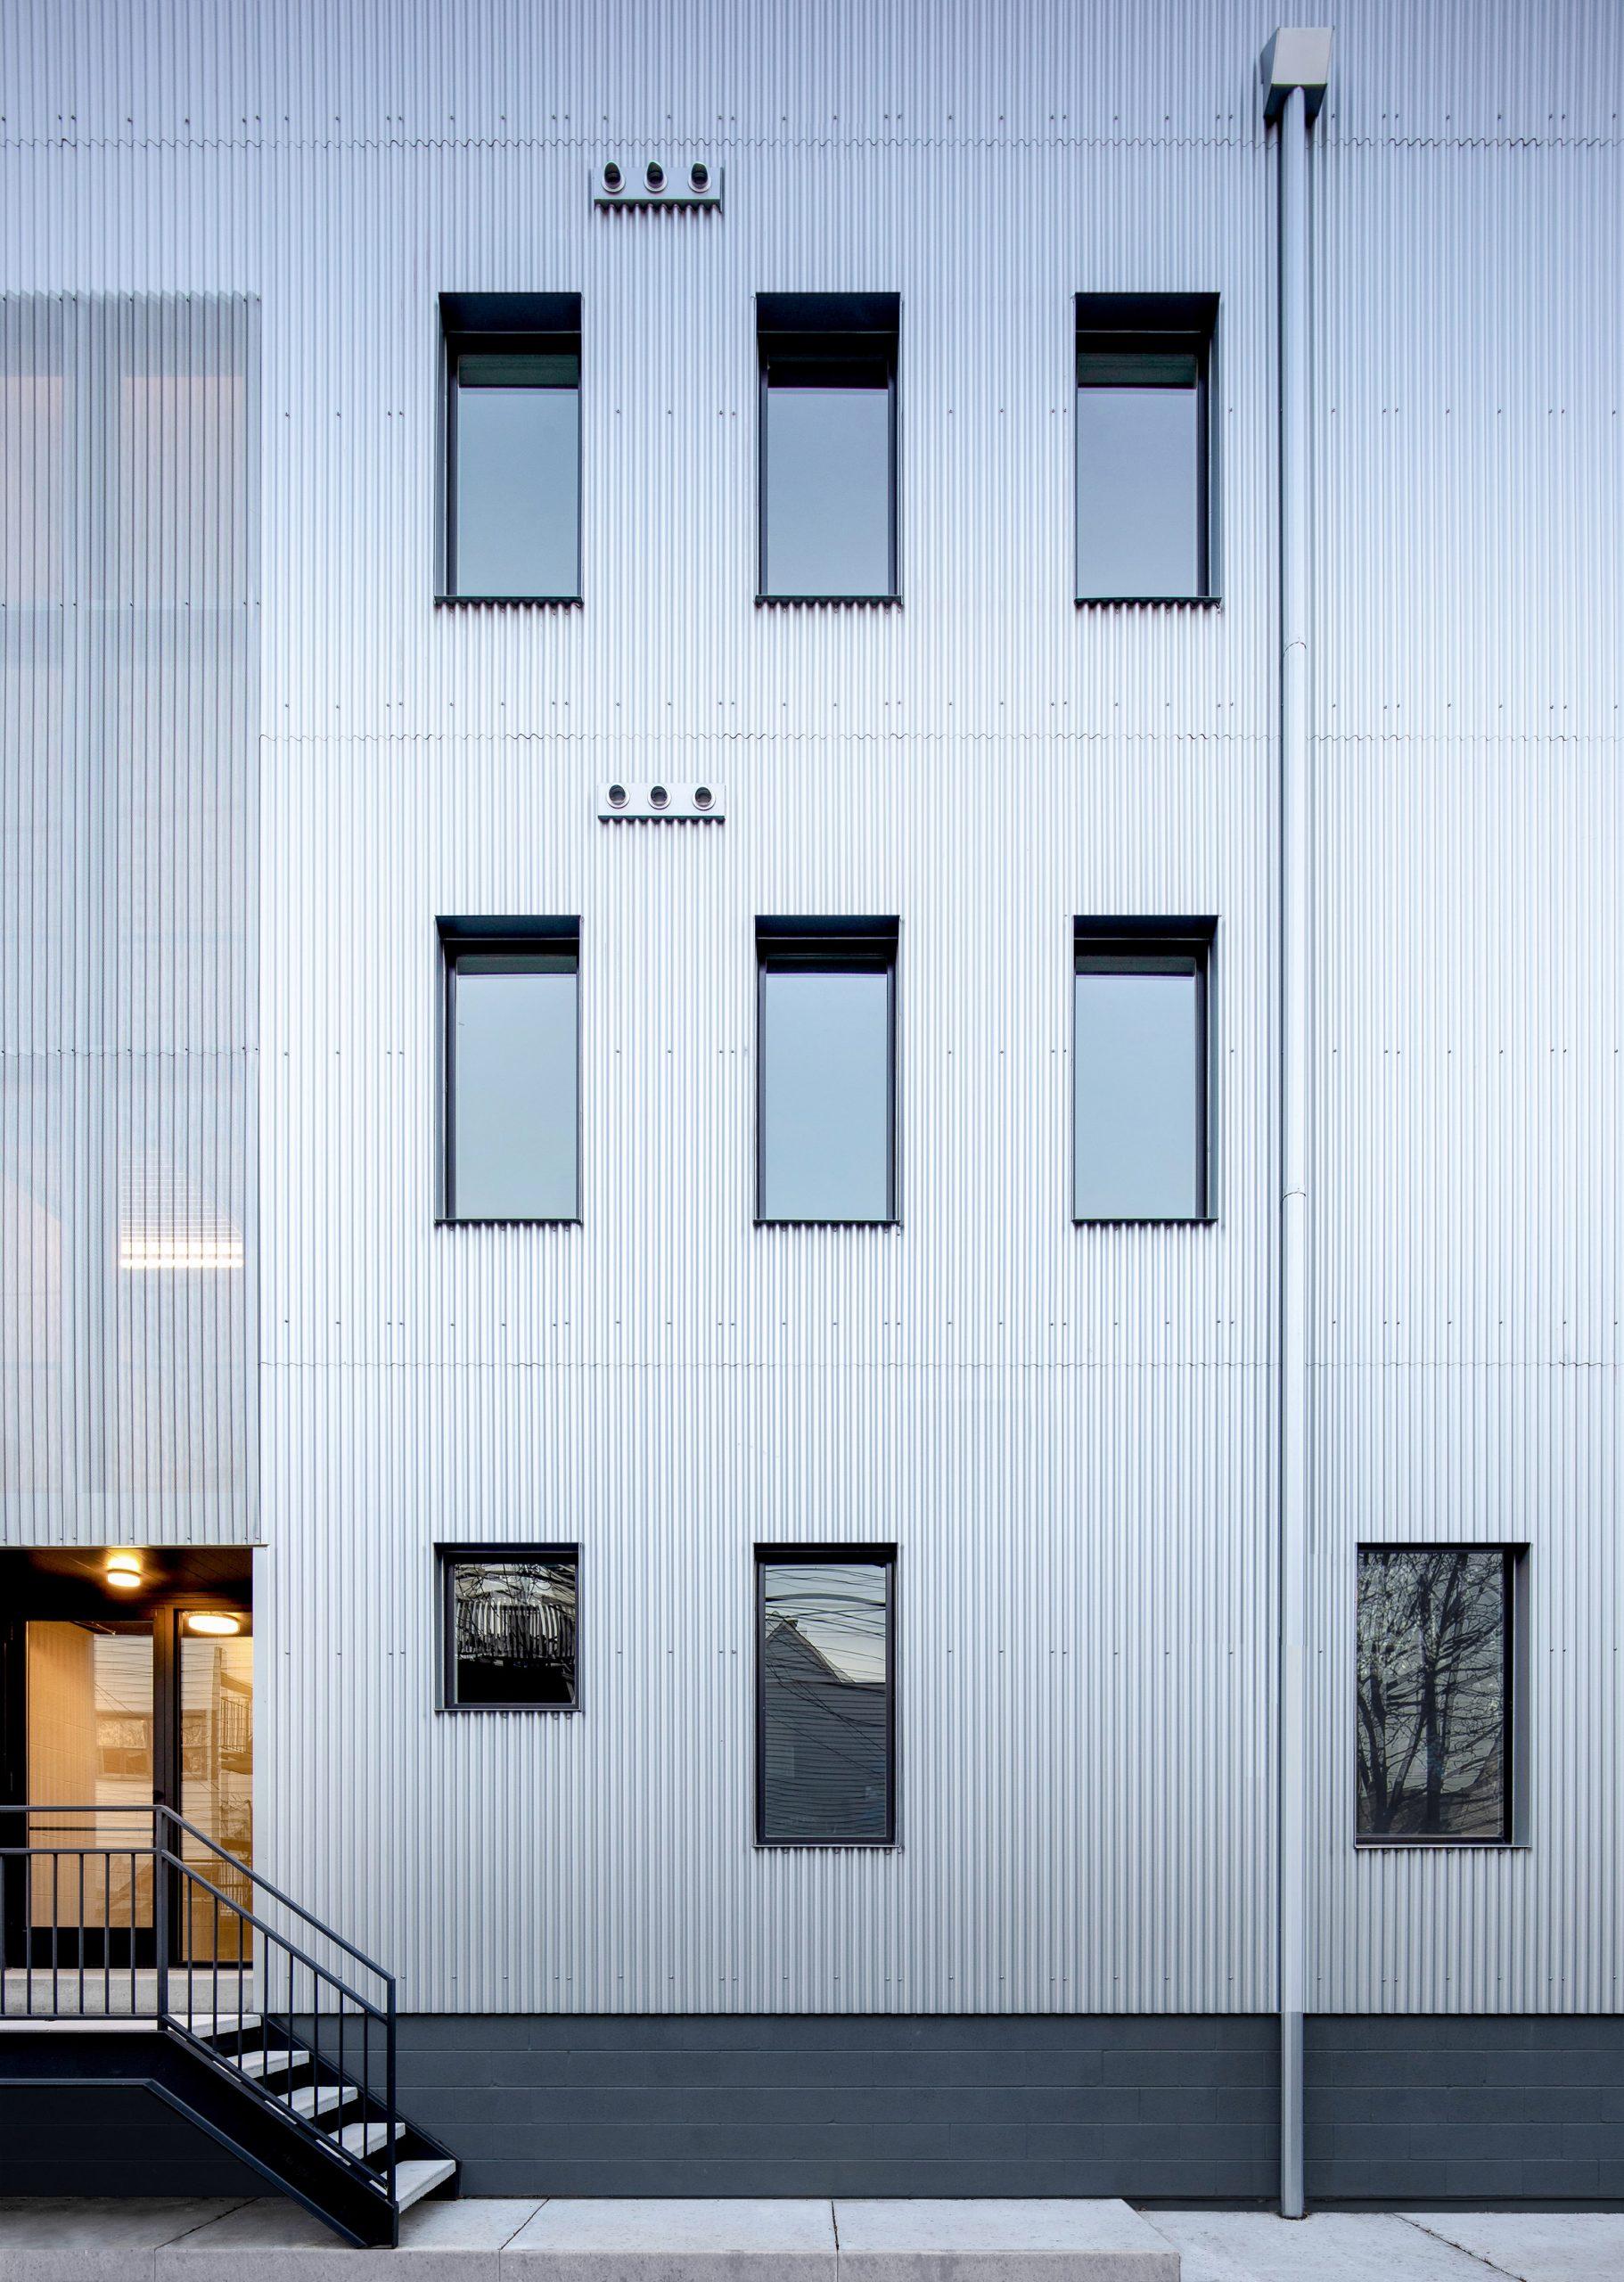 Corrugated metal cladding